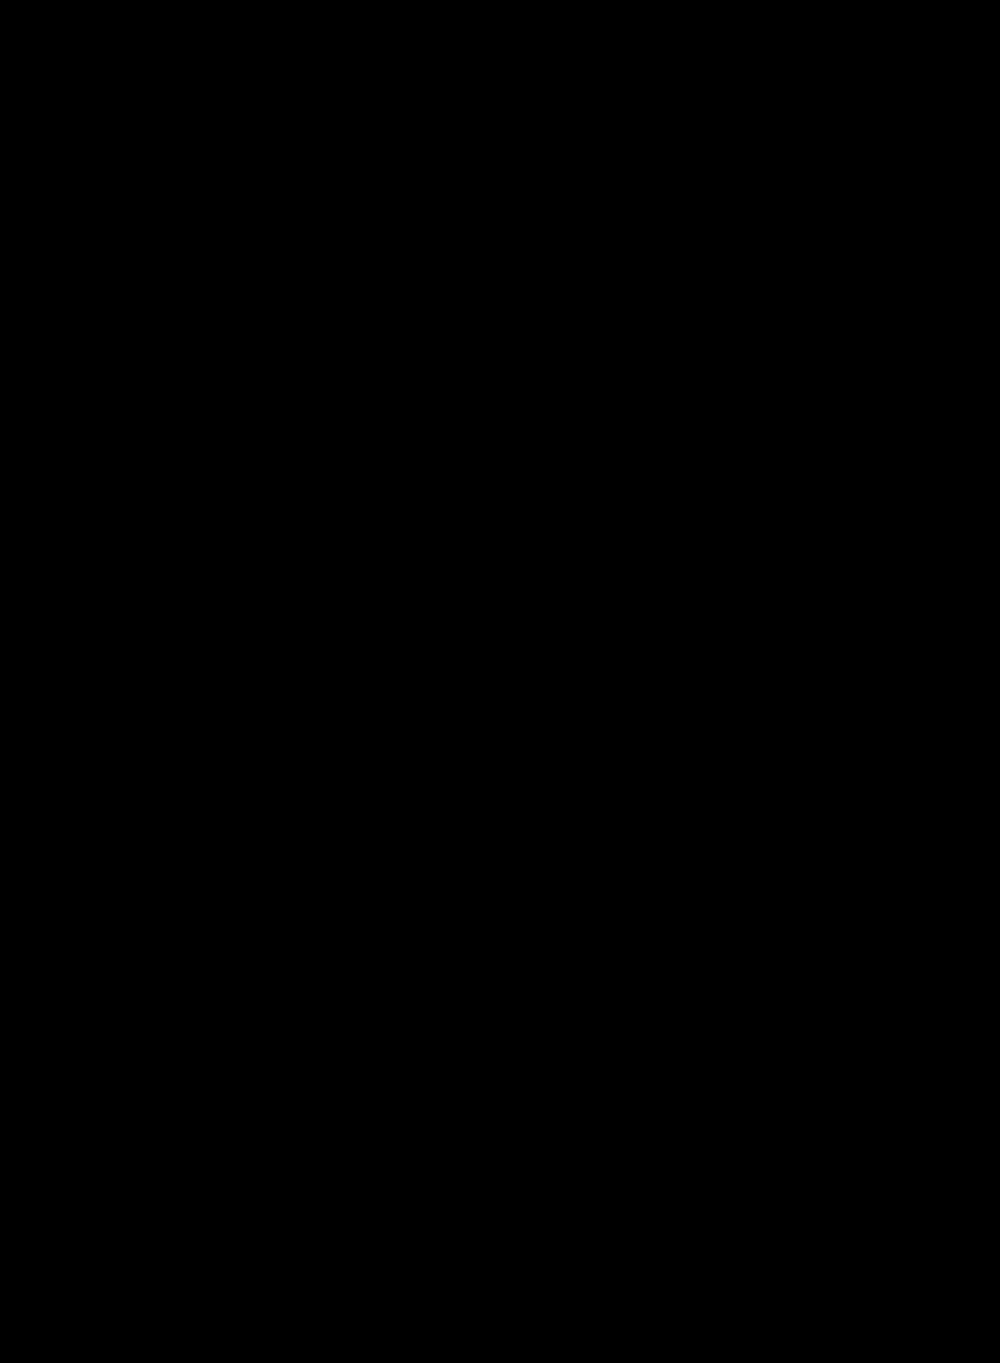 mendleton_logo_bk_print_300dpi.png